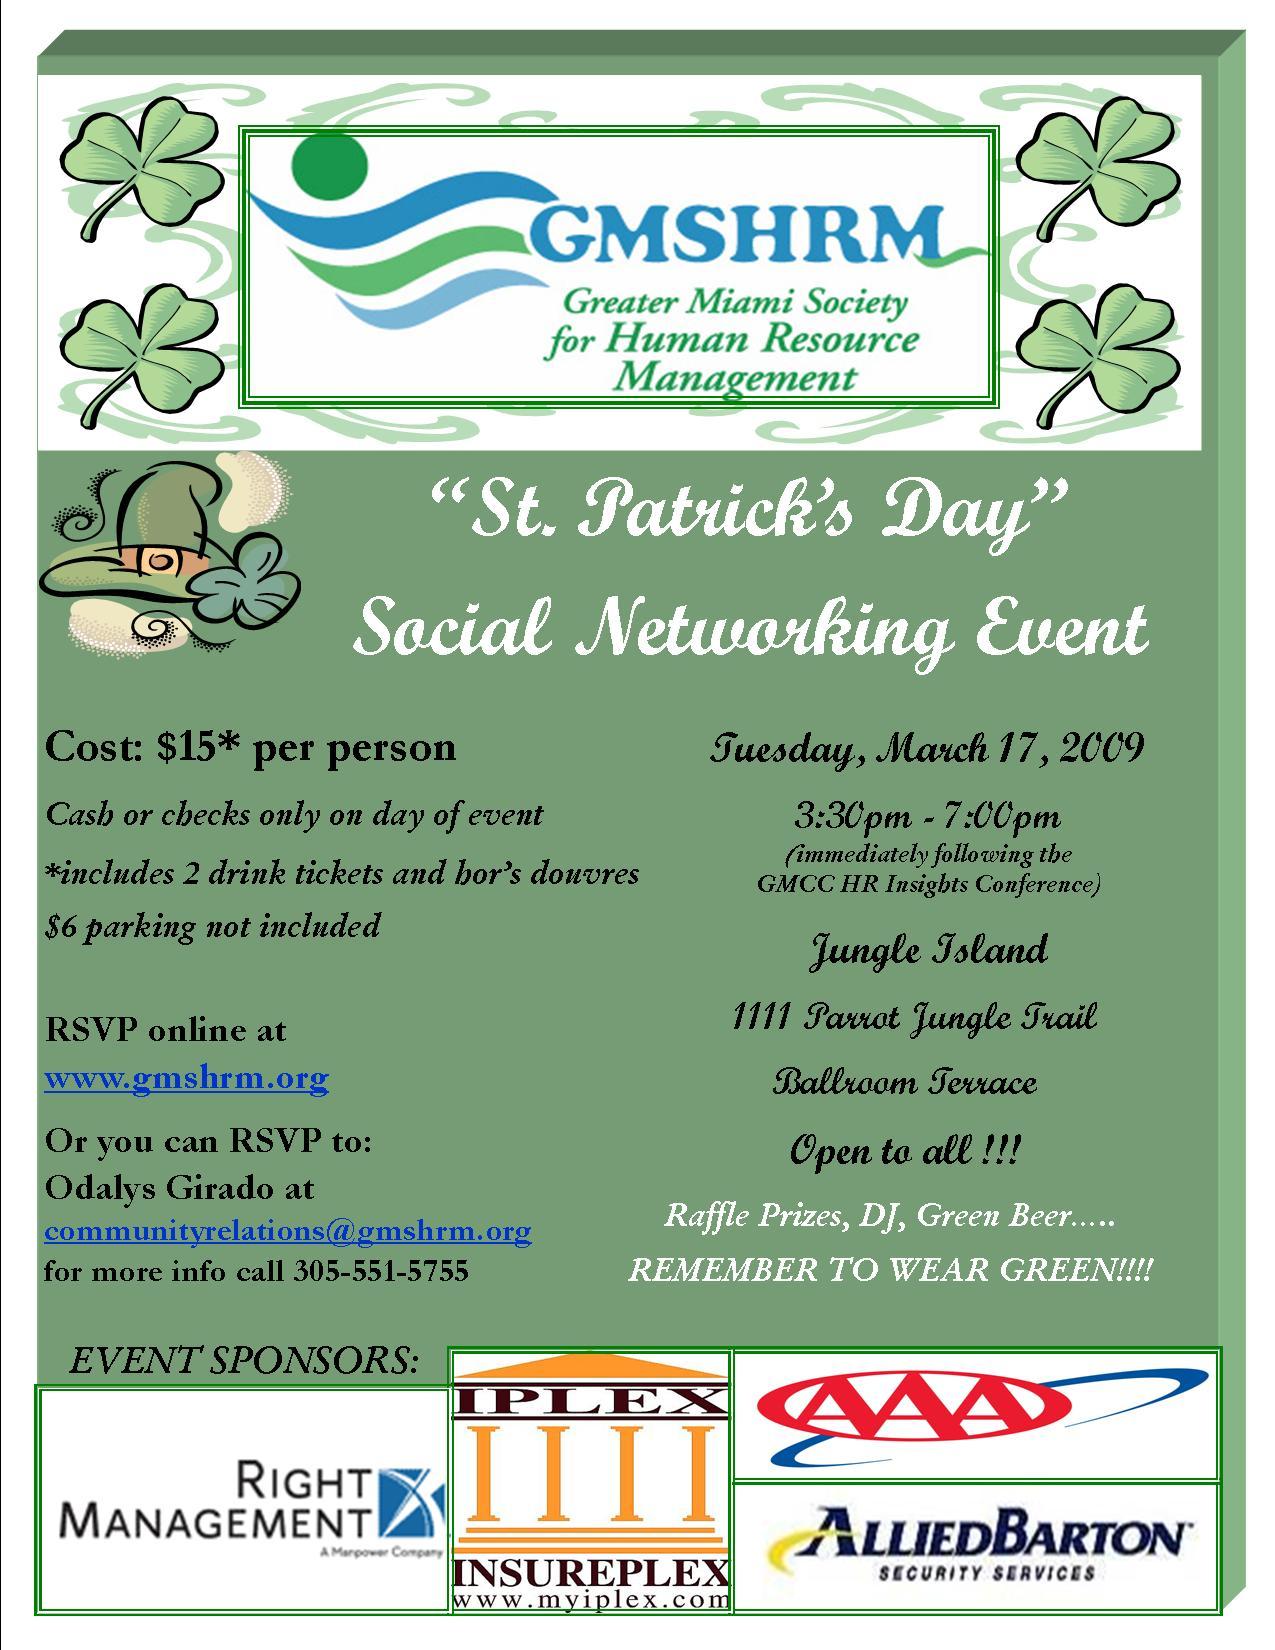 gmshrm-social-networker-flyer-3-17-09-final